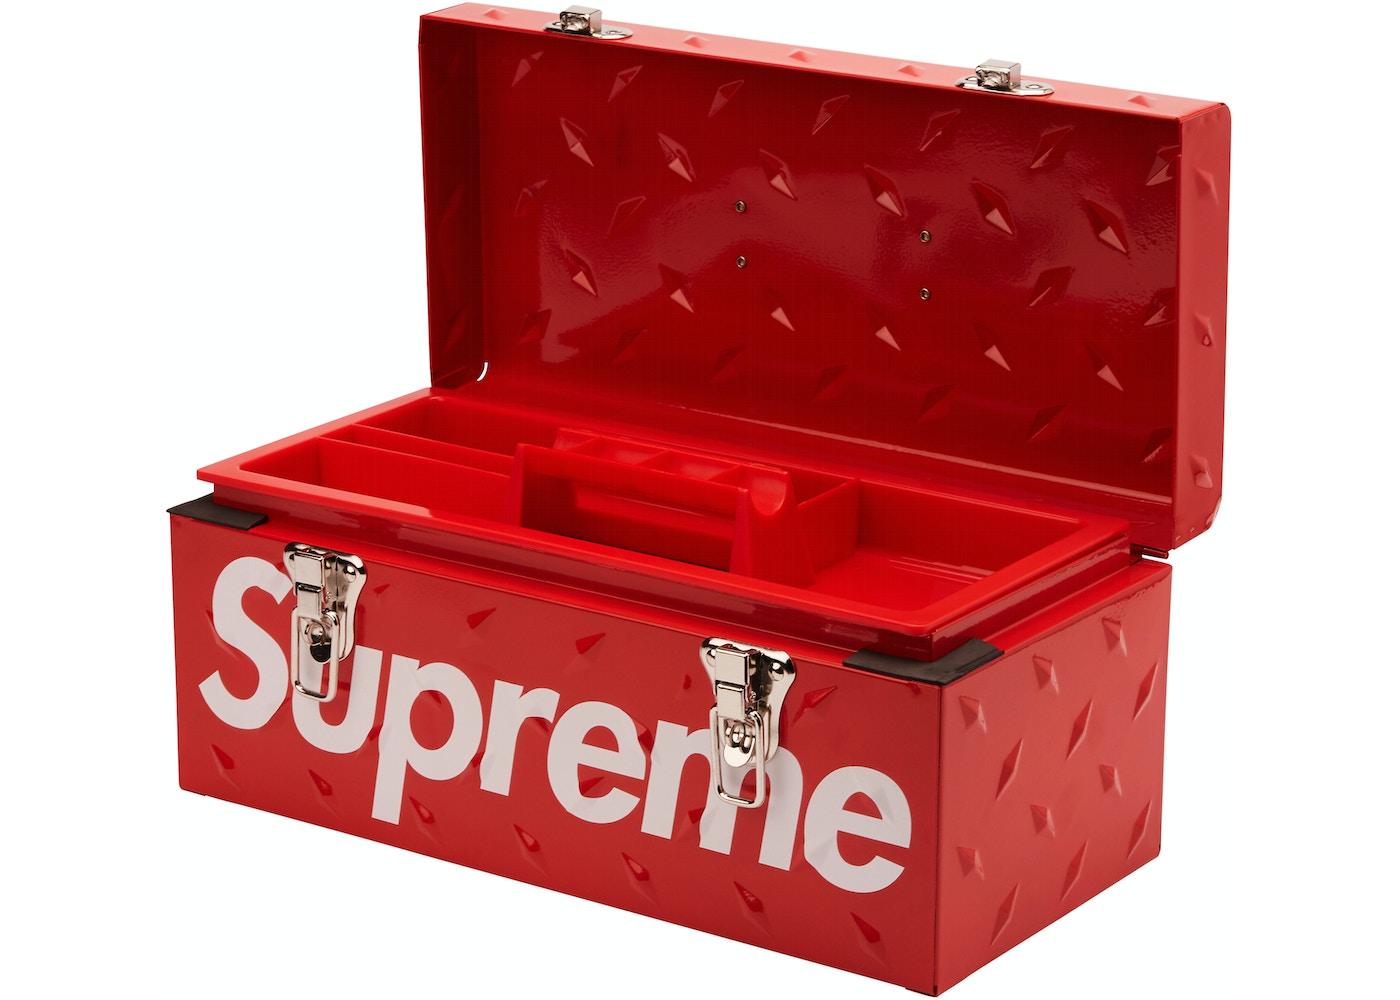 Supreme Diamond Plate Tool Box Red